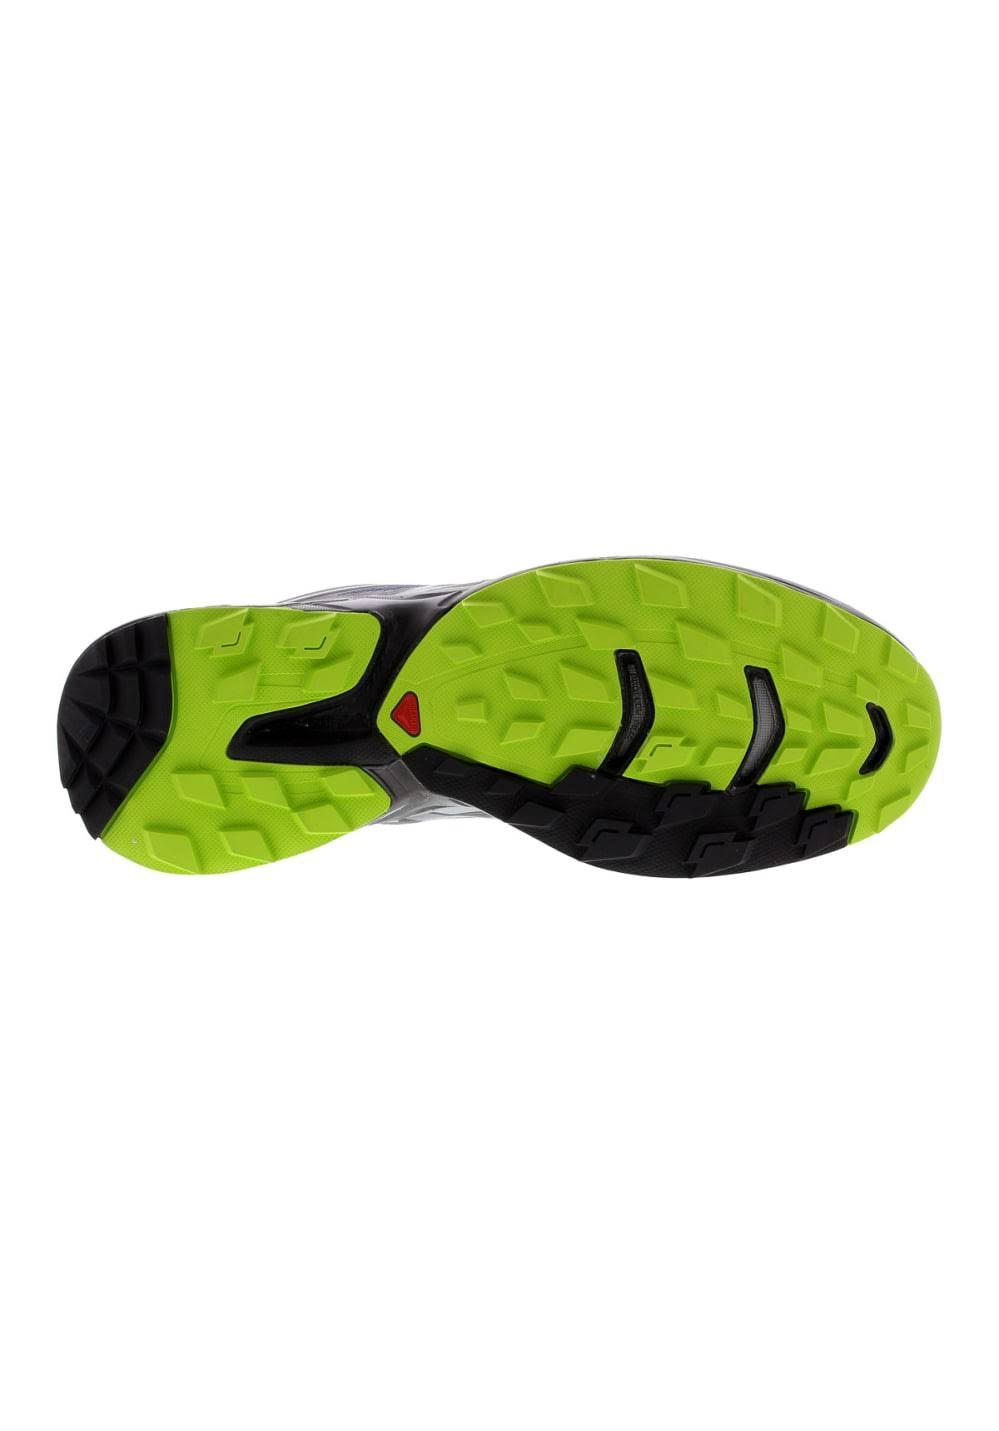 light granny Blue For Men Salomon Pro Black Wings Slate Green Onix Running Shoes 2 4nqvz7qAw